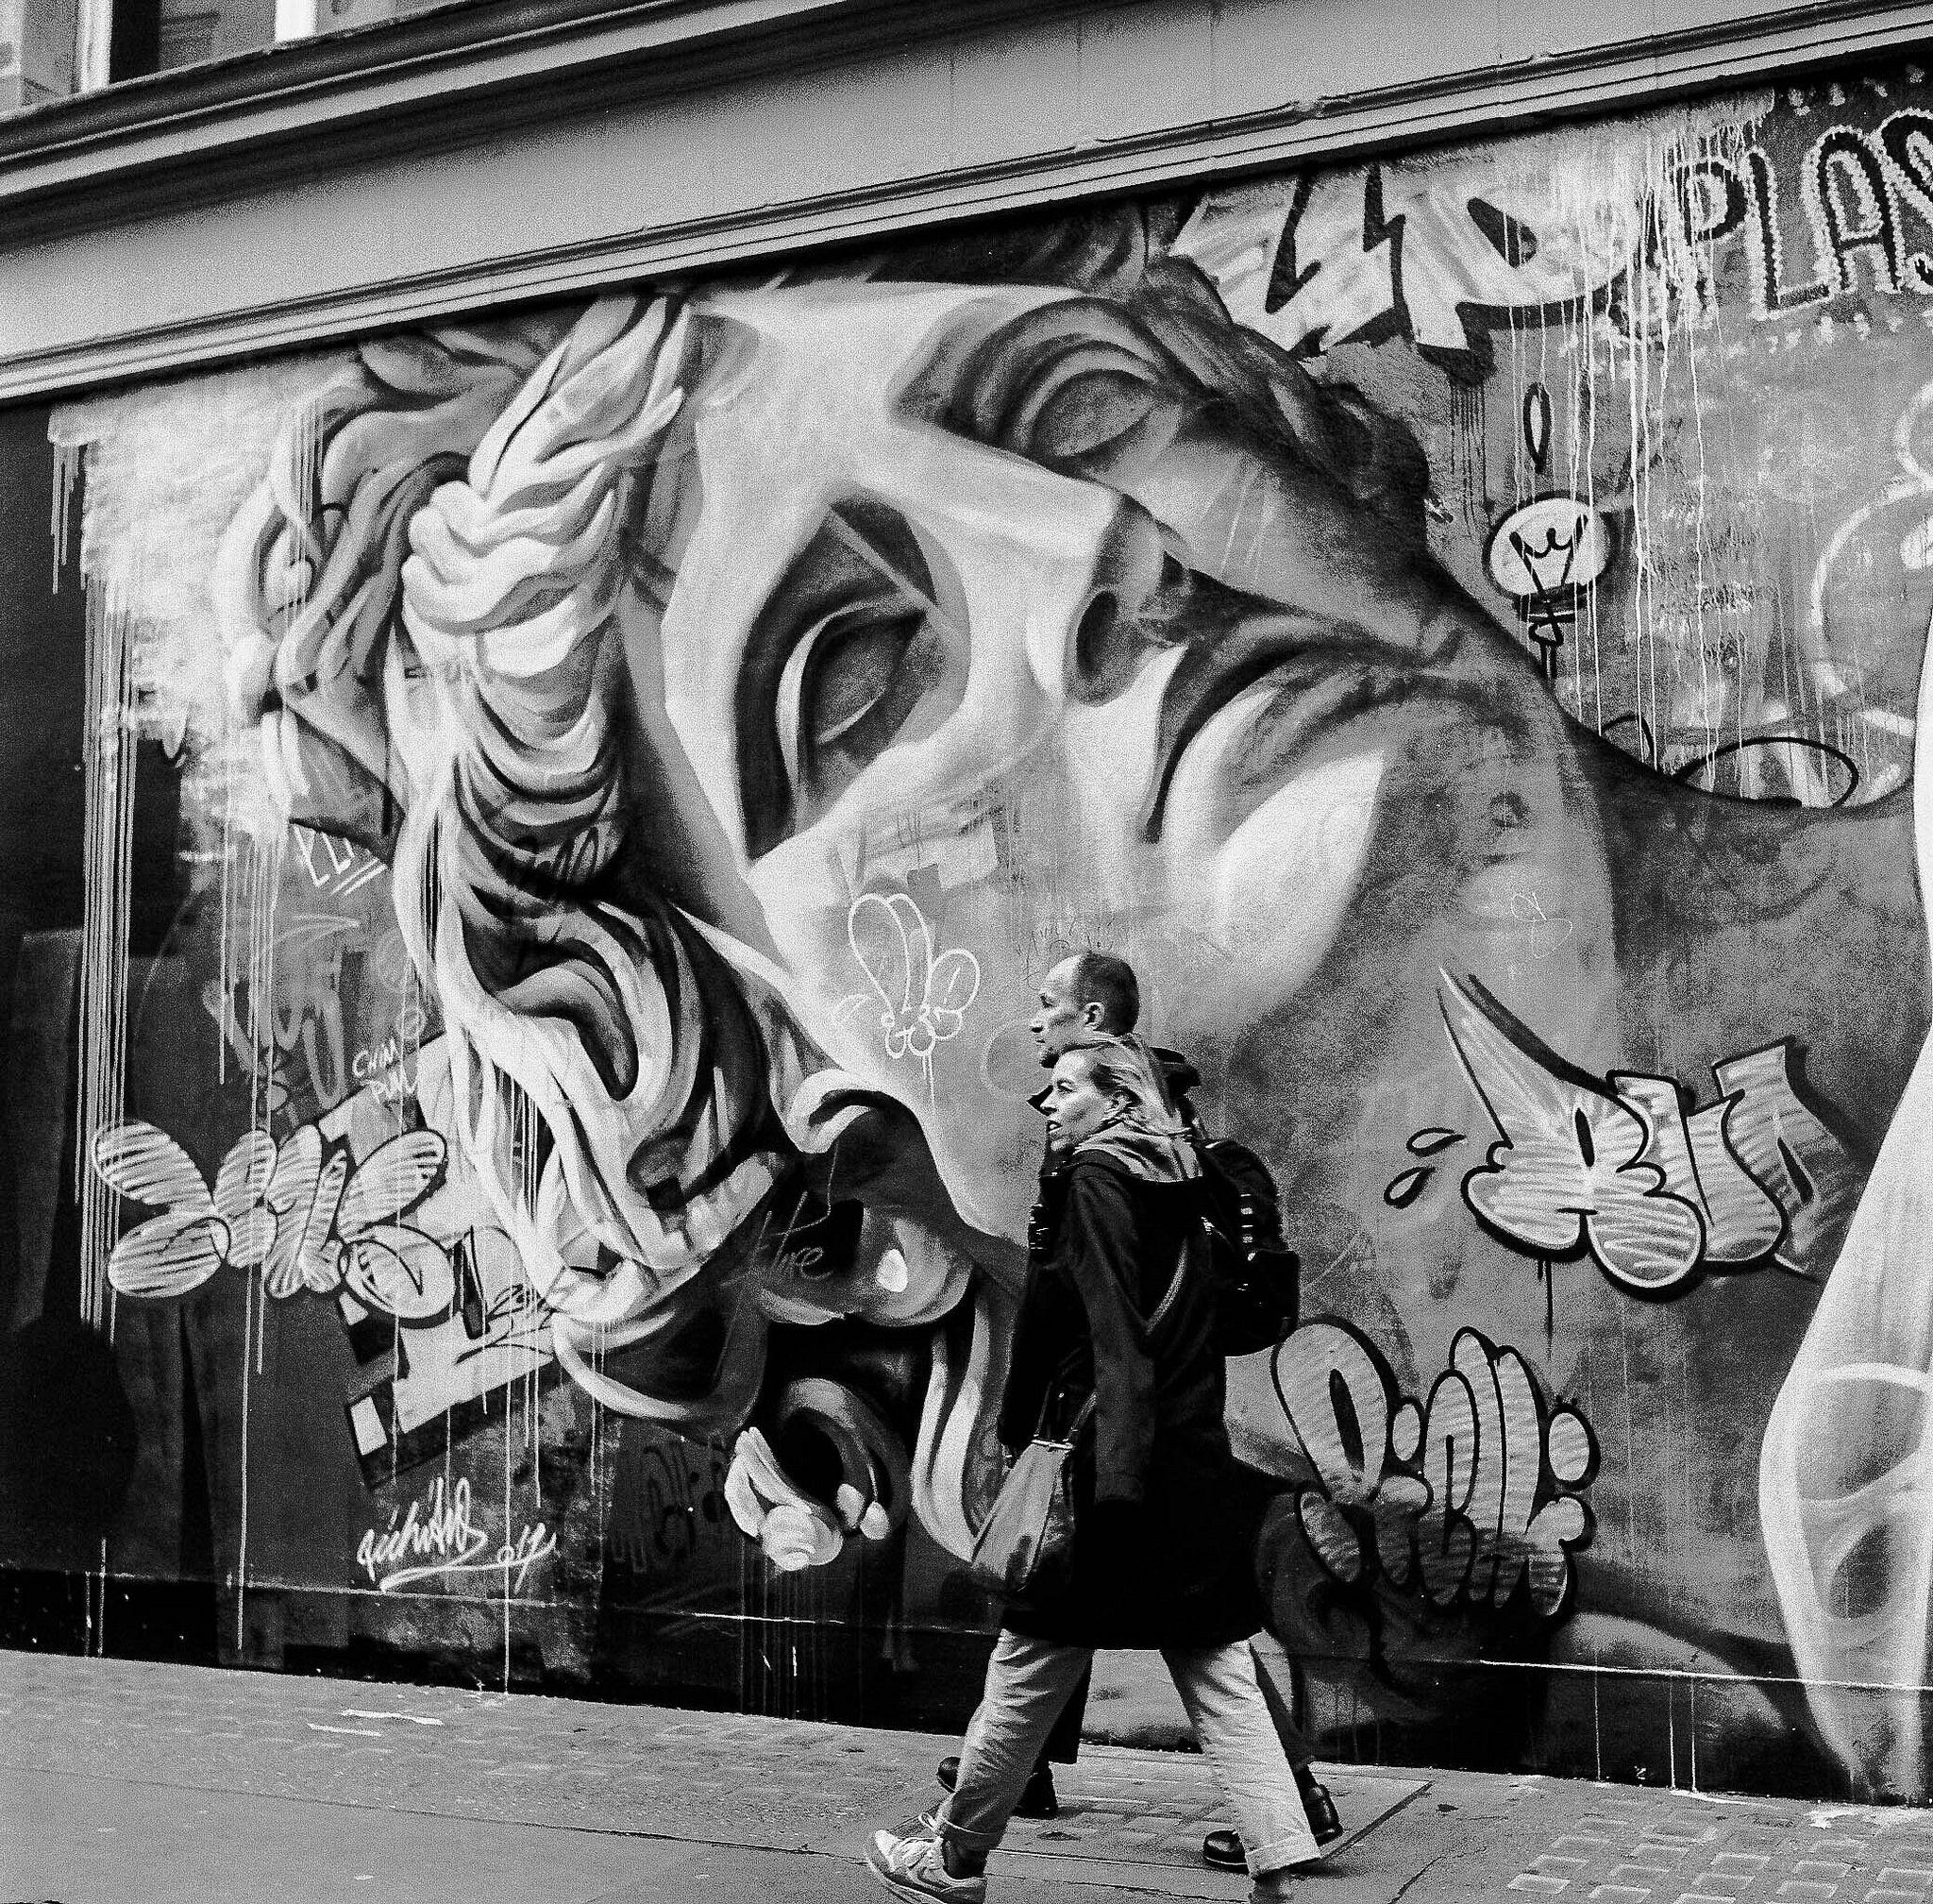 Faces berwick street london vivian maier films and street